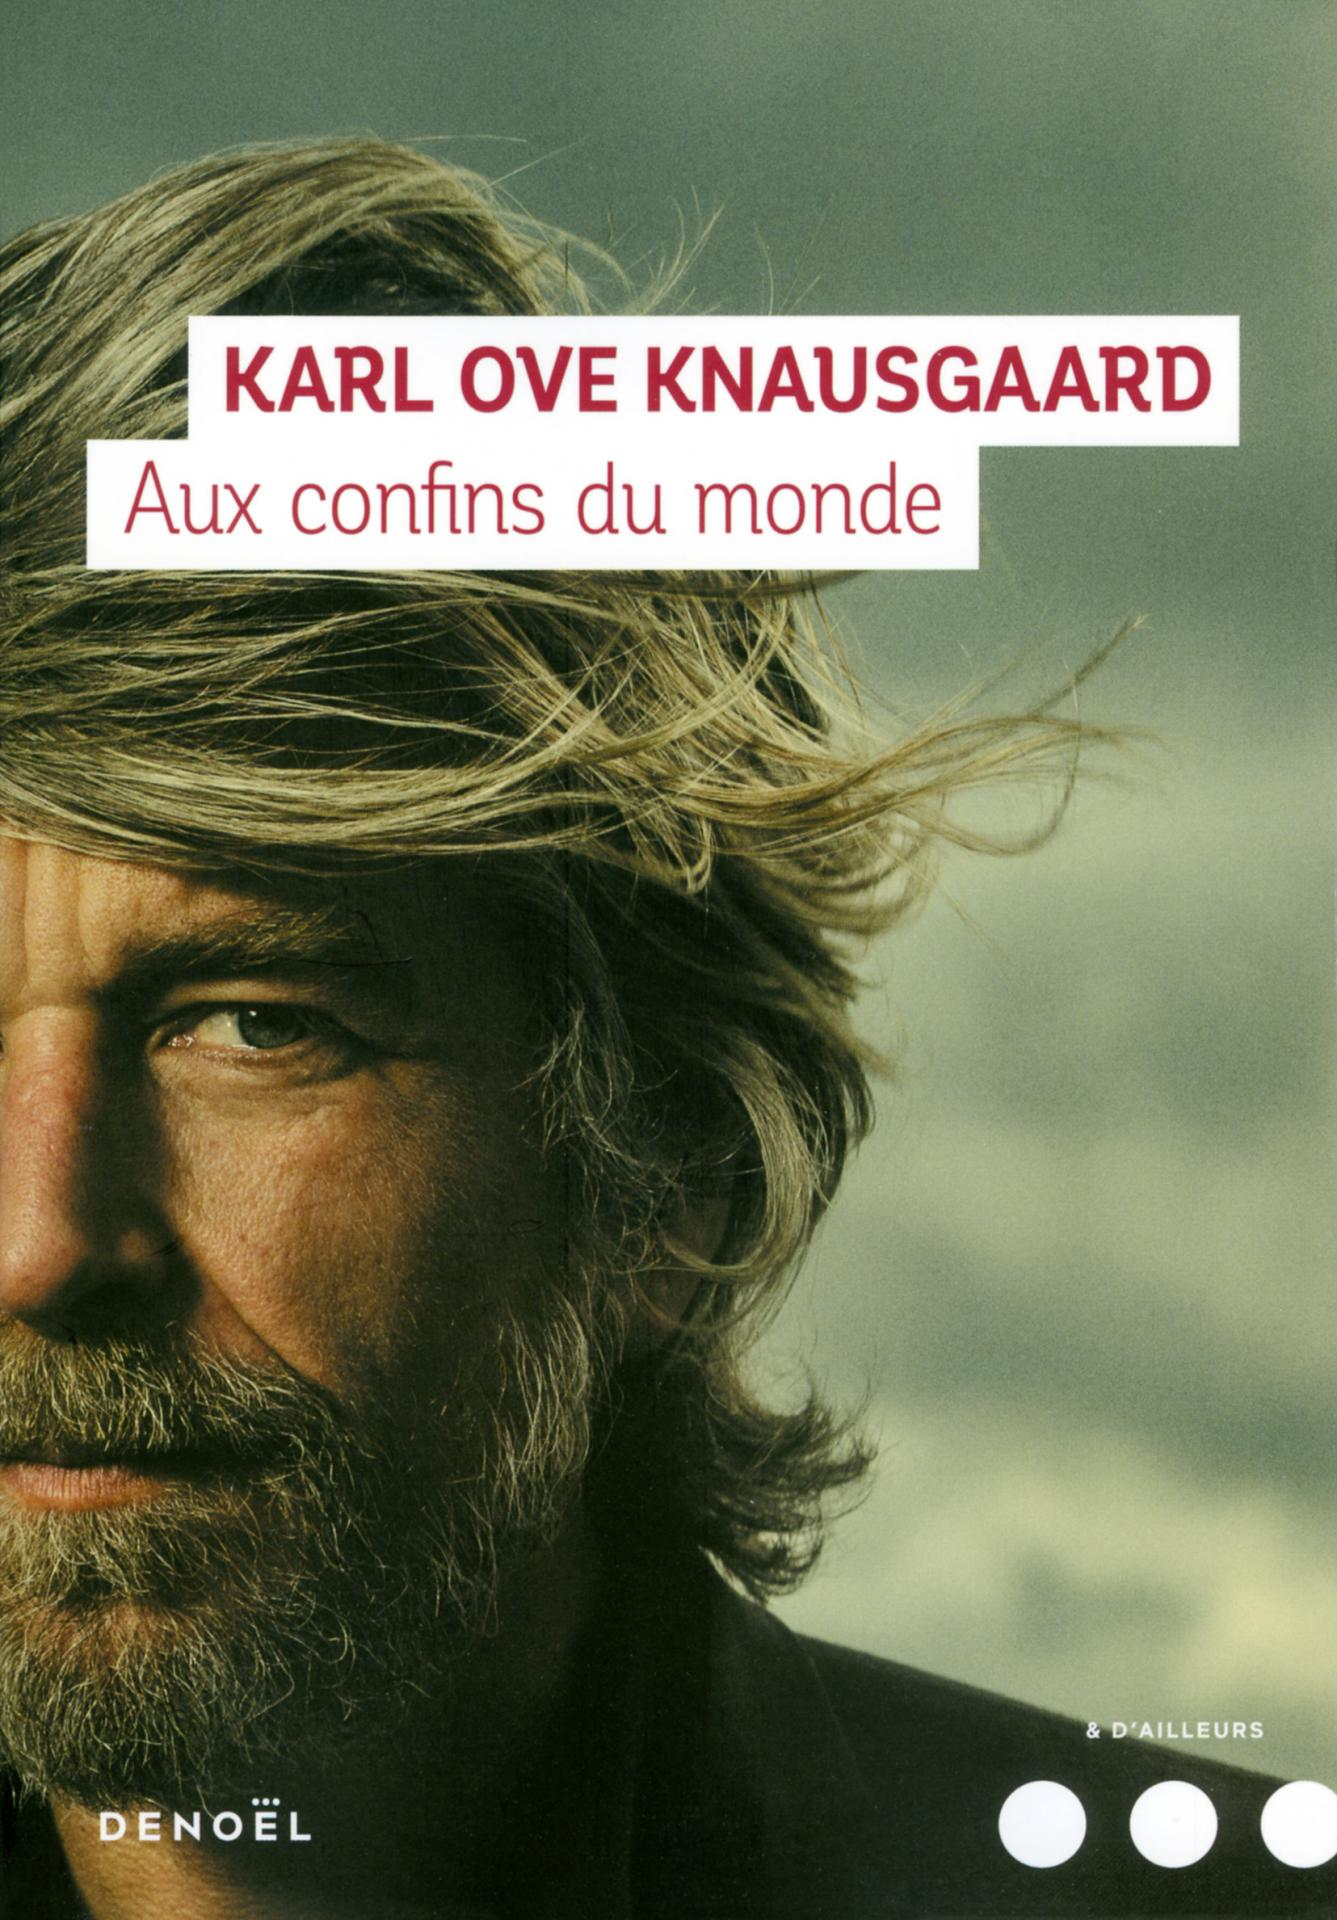 Aux confins du monde - Karl Ove Knausgaard